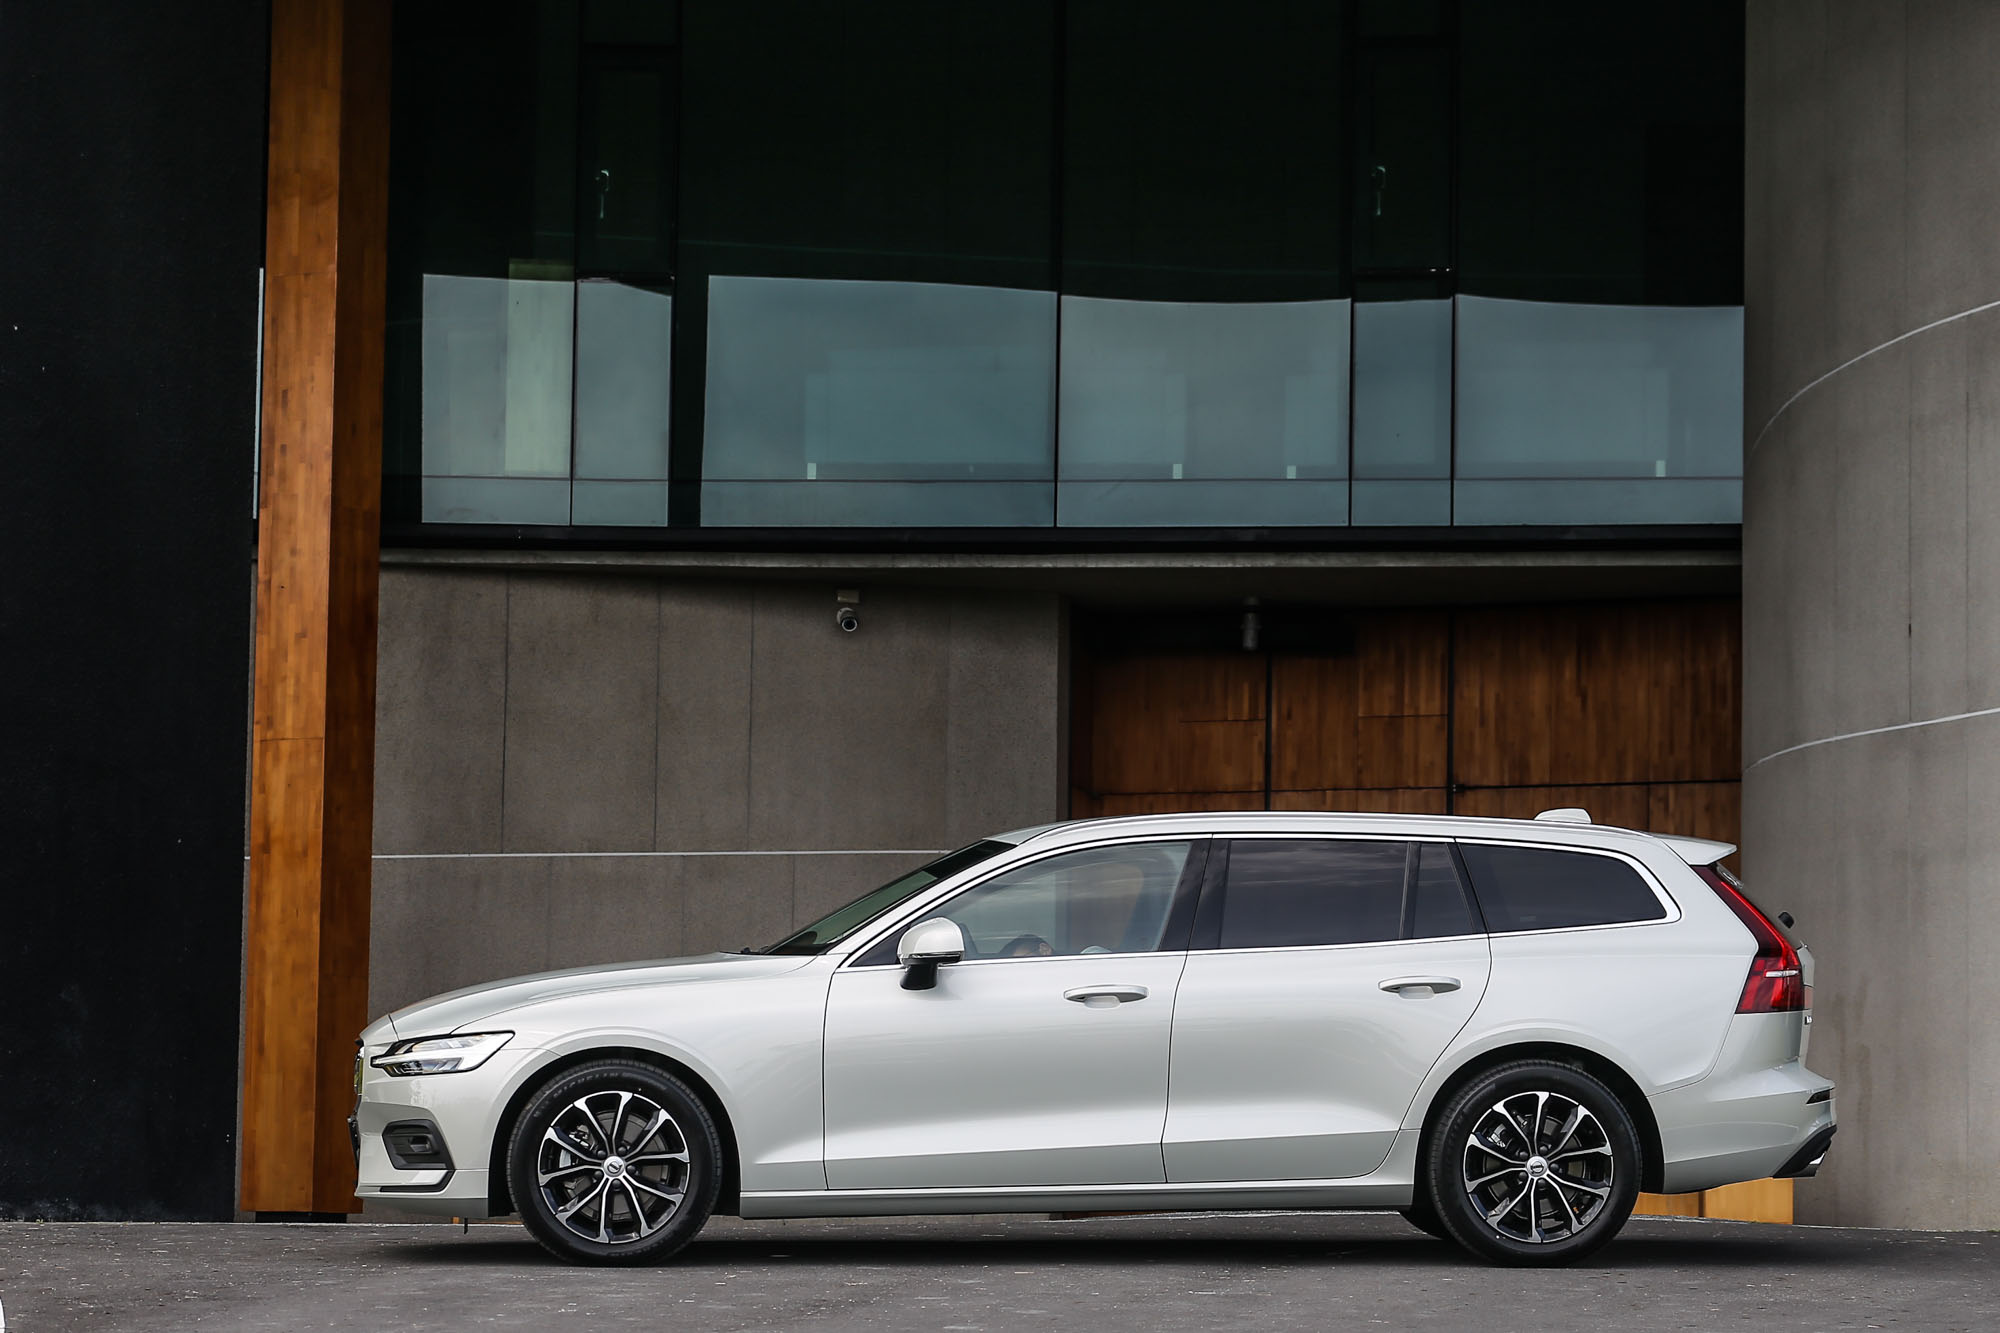 V90 車系在台停售之後,新世代 V60 就是消費者目前唯一可以買到的 Volvo 旗下純種旅行車型。